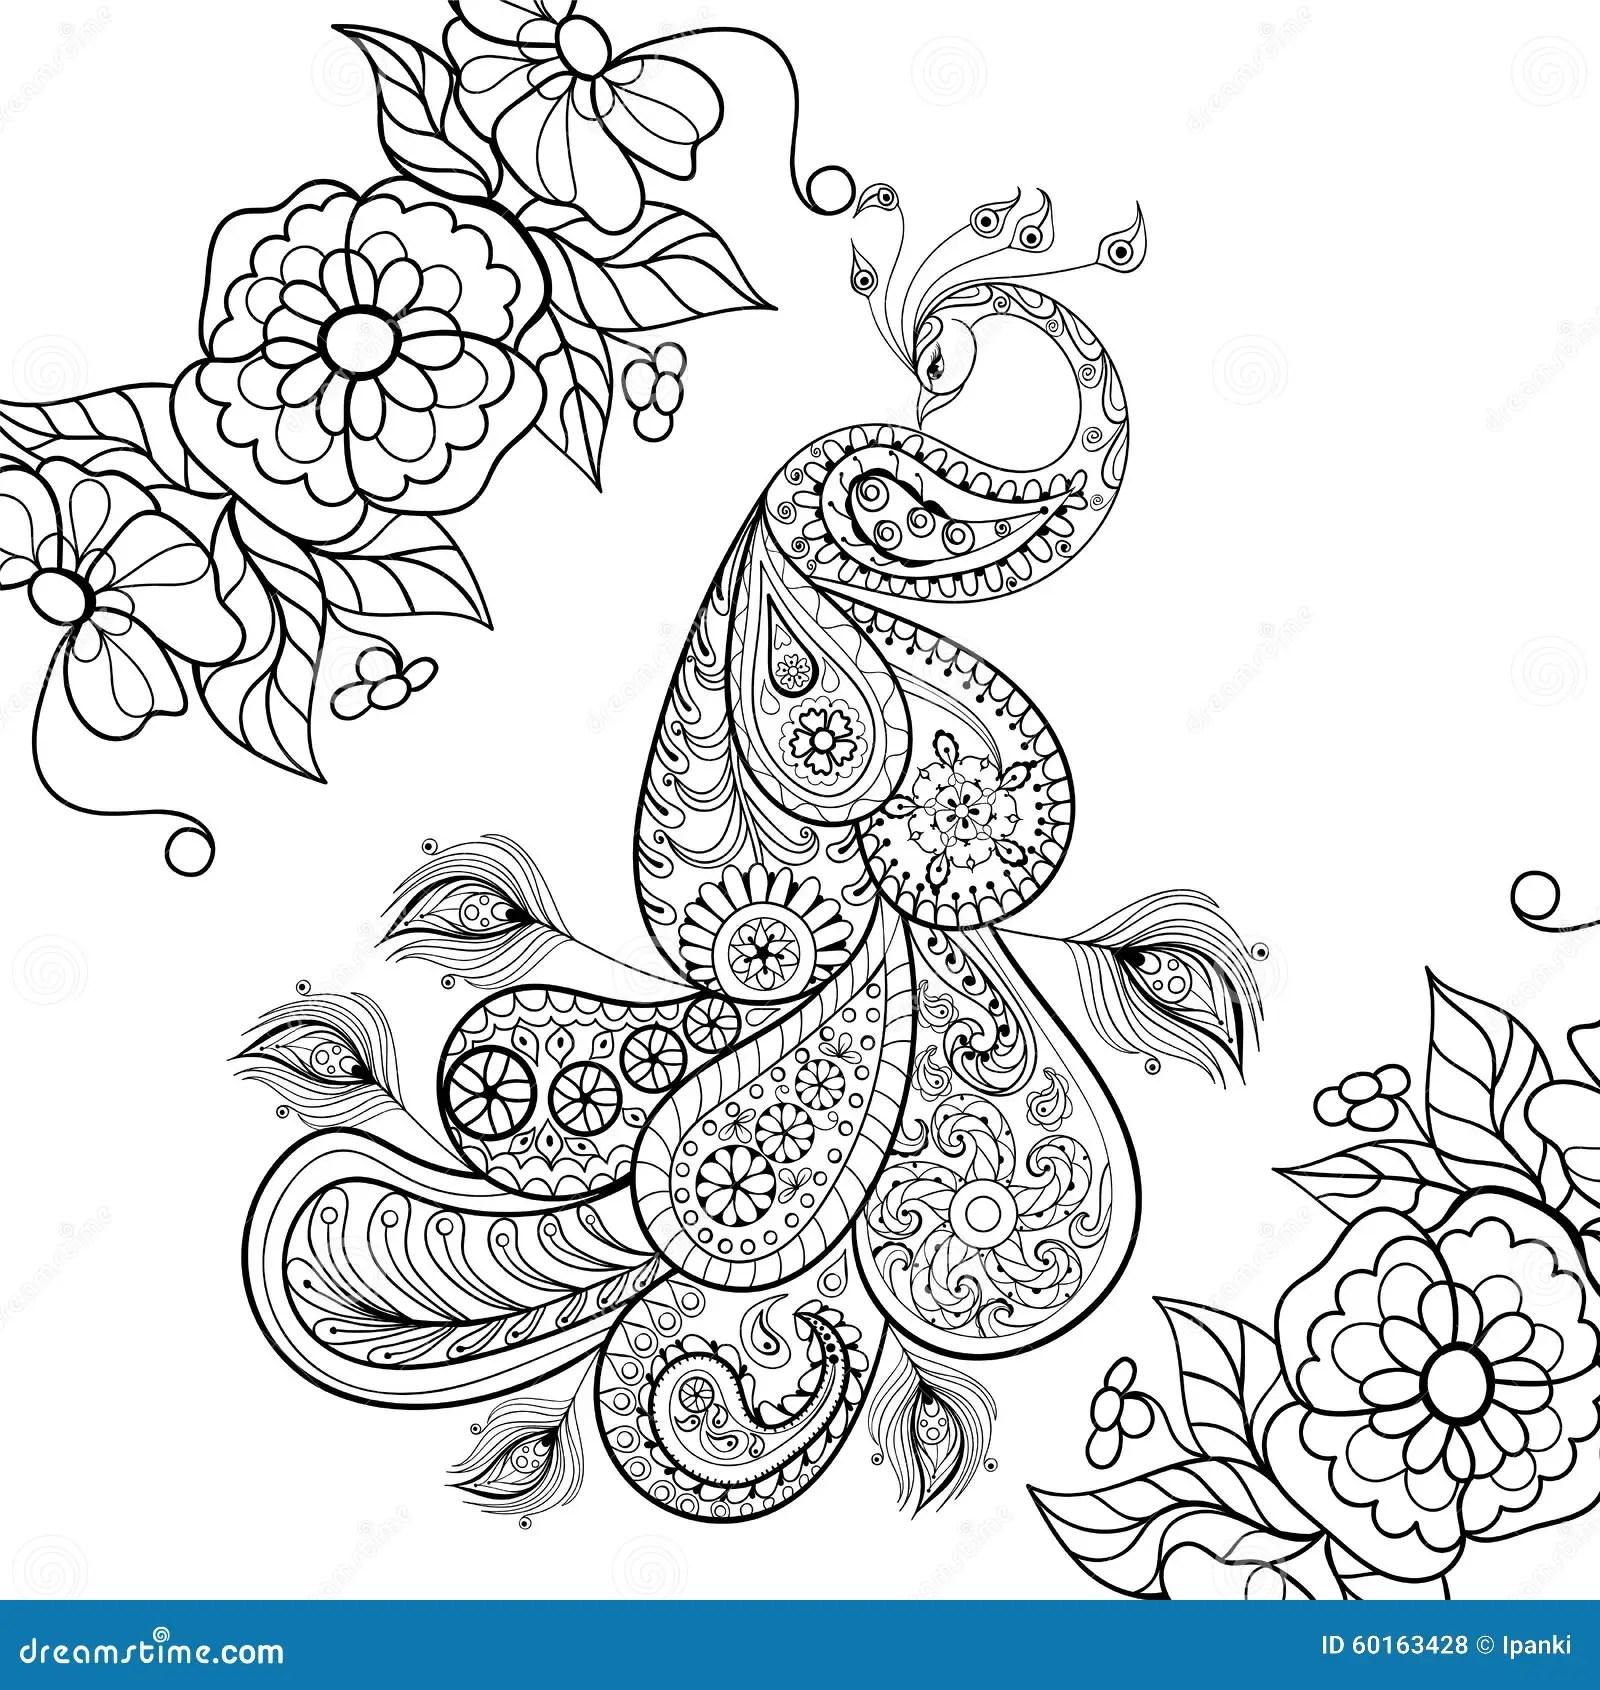 Zentangle Peacock Totem In Flowersfor Adult Anti Stress